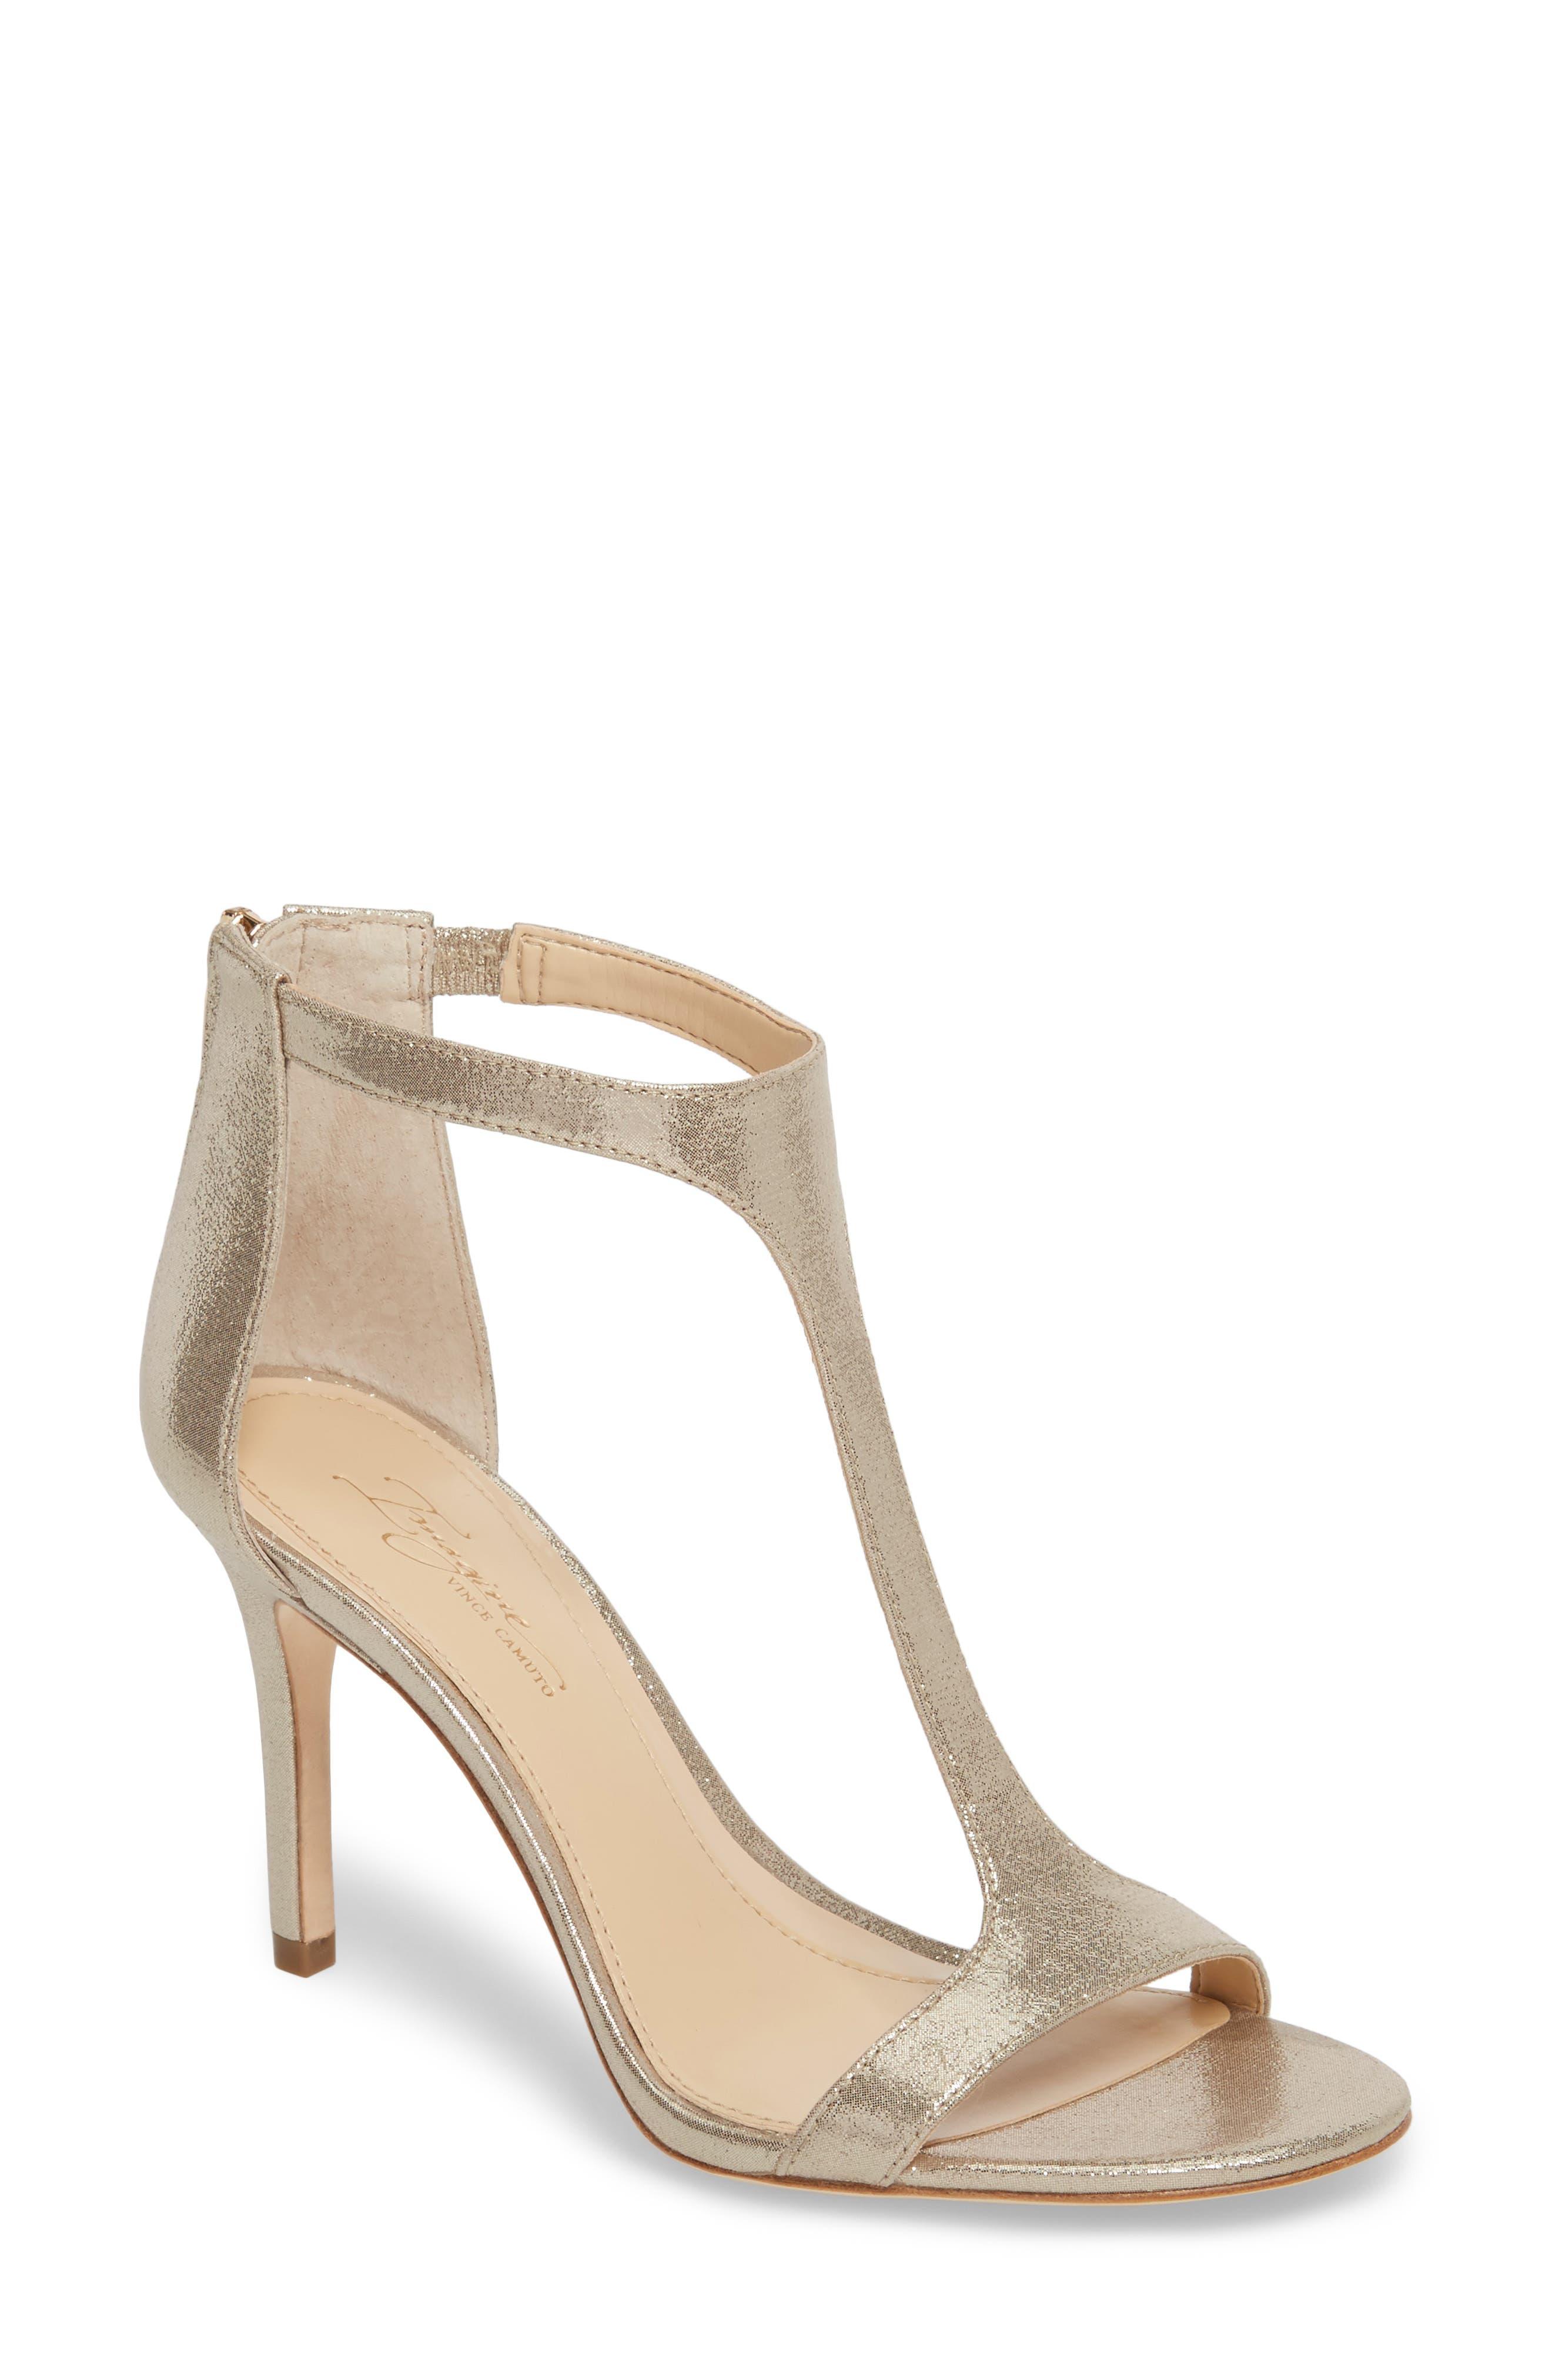 'Phoebe' Embellished T-Strap Sandal,                             Main thumbnail 4, color,